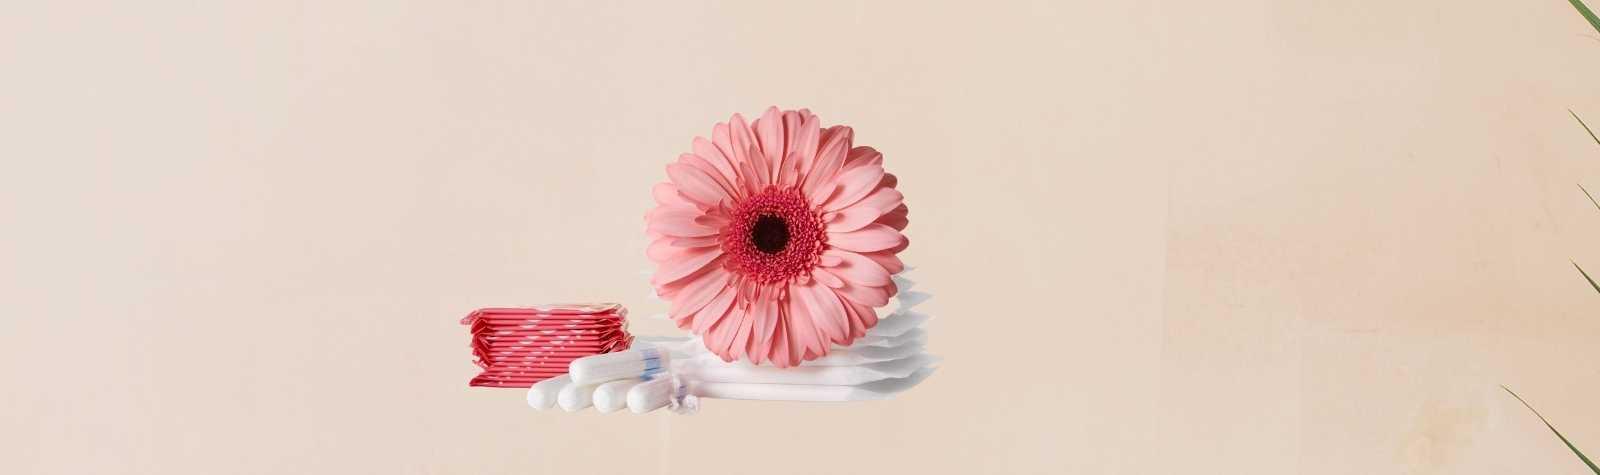 How to remove menstrual clots ?